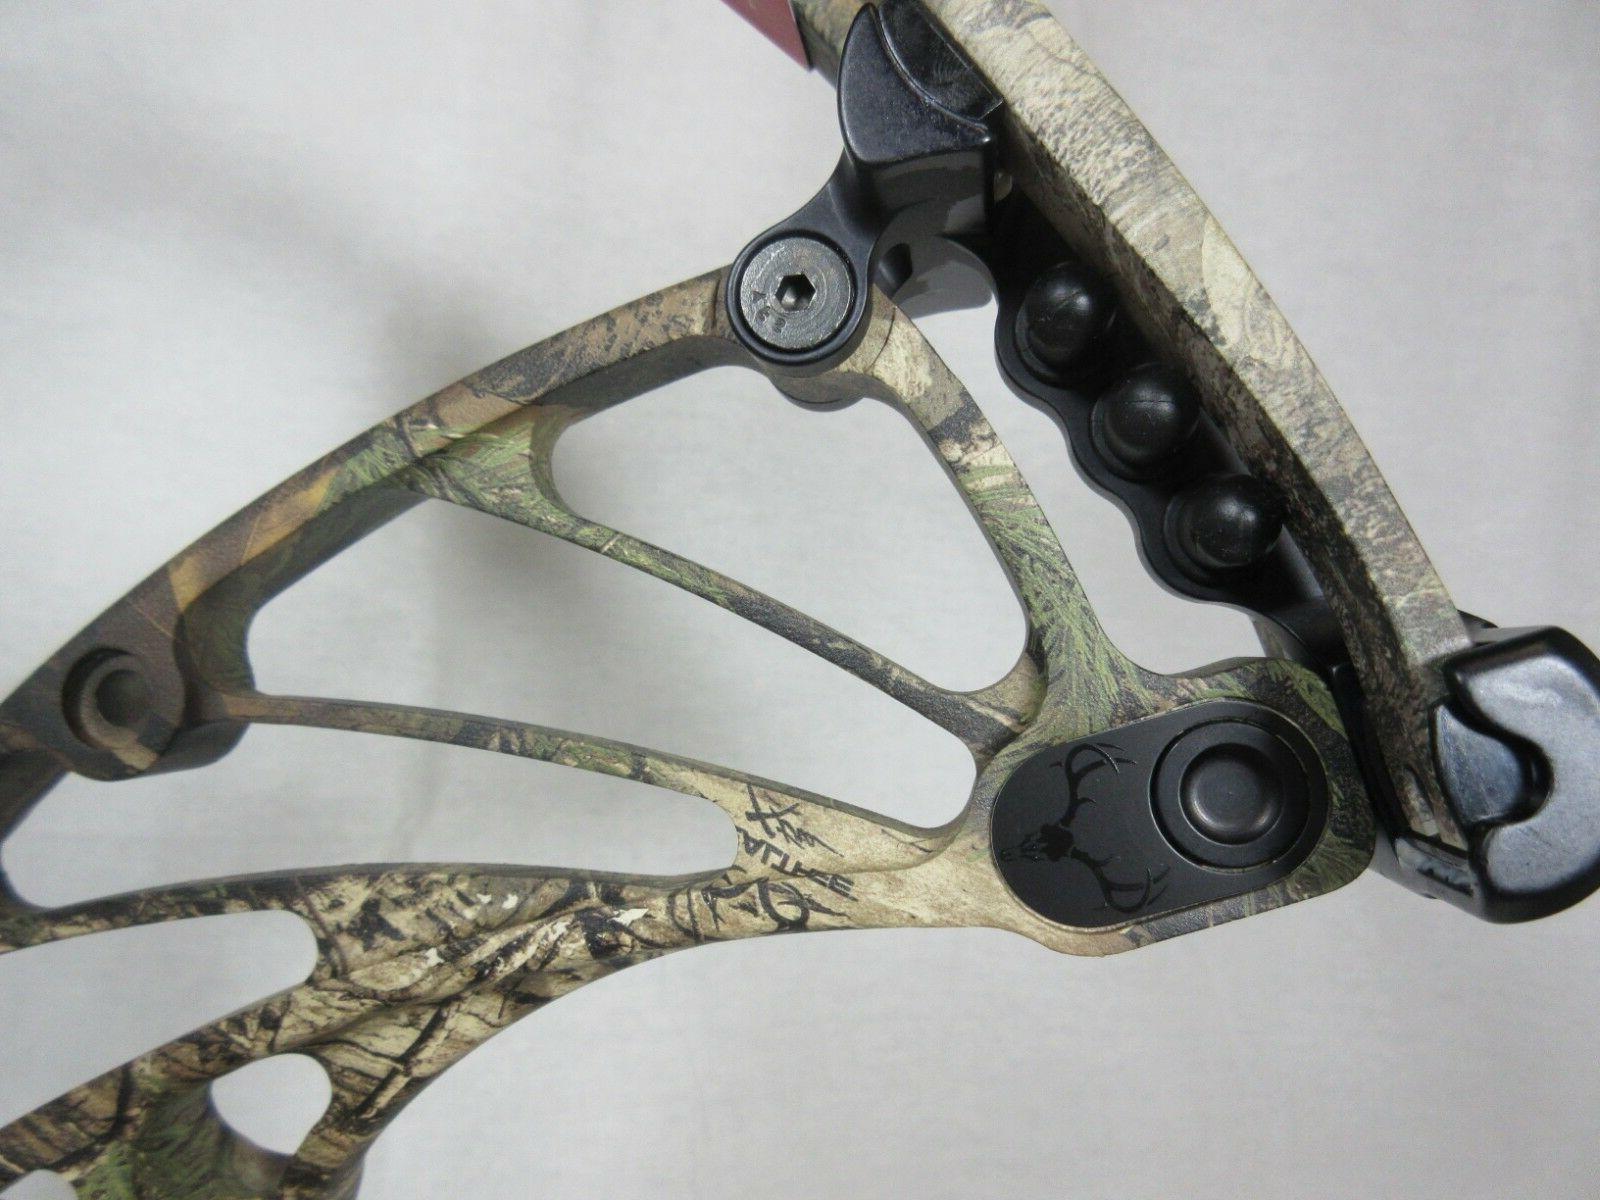 Hoyt Defiant Compound Bow Camo Various Hand